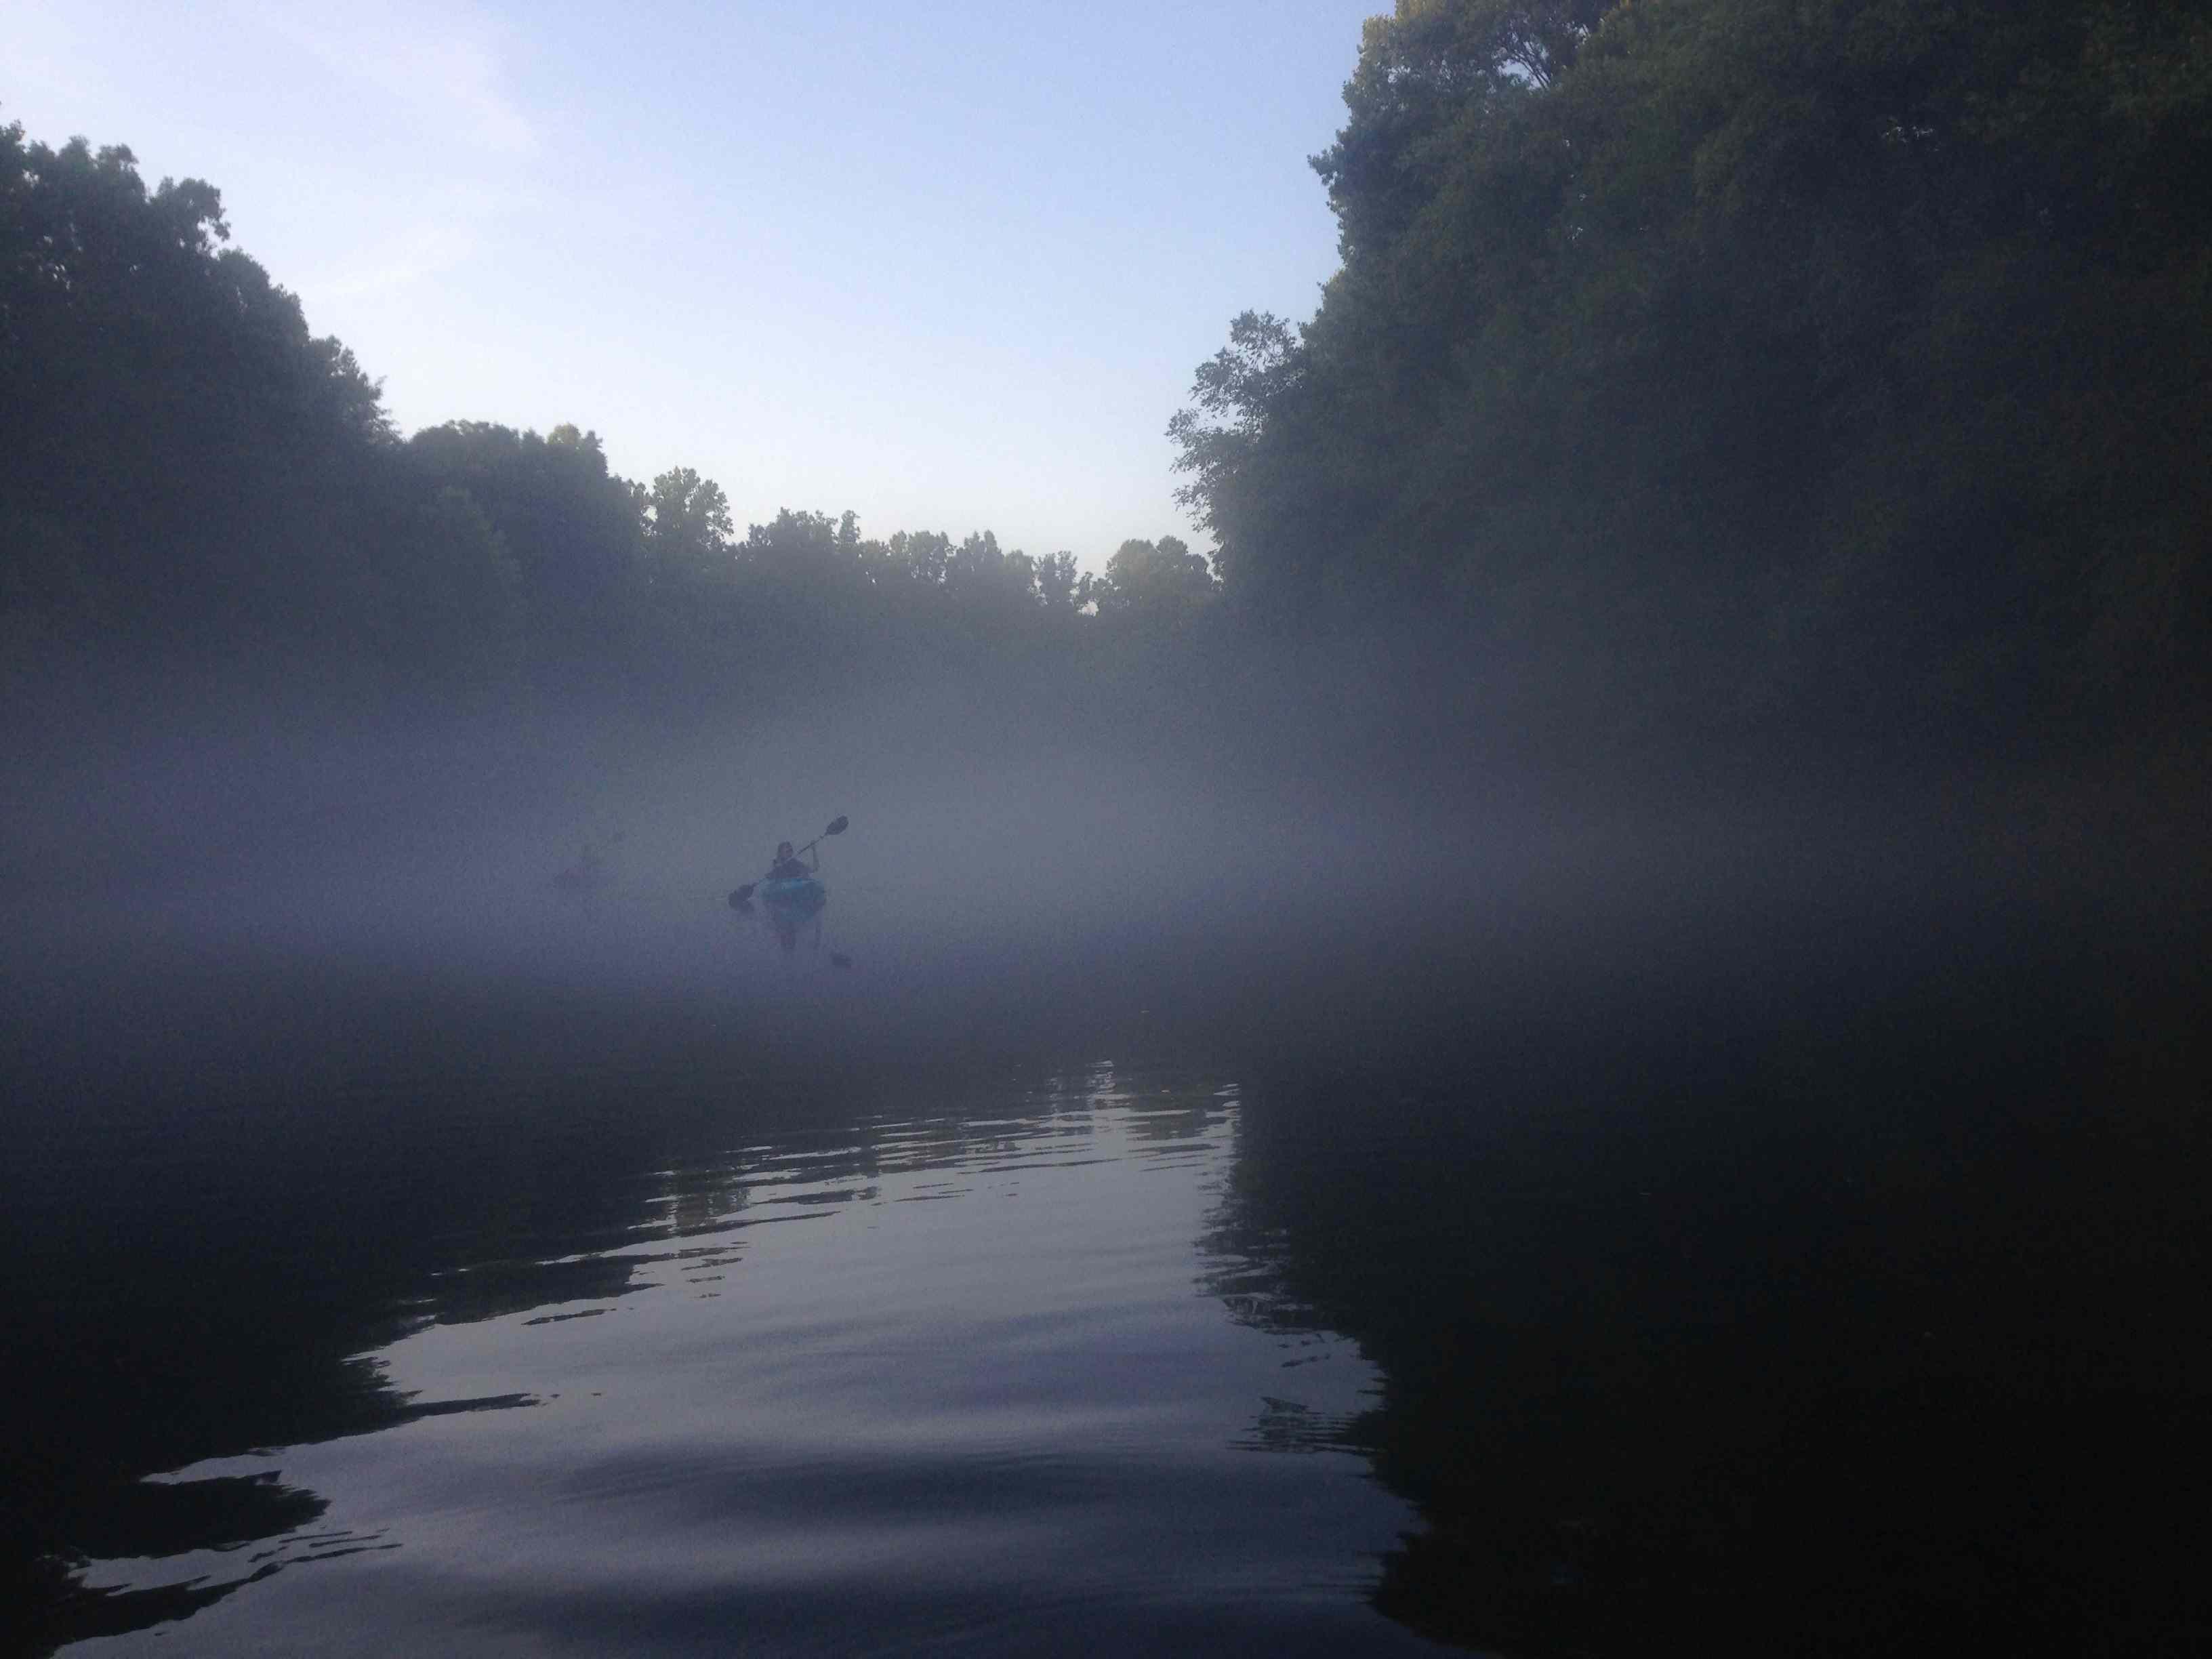 Chattahoochee River kayaking